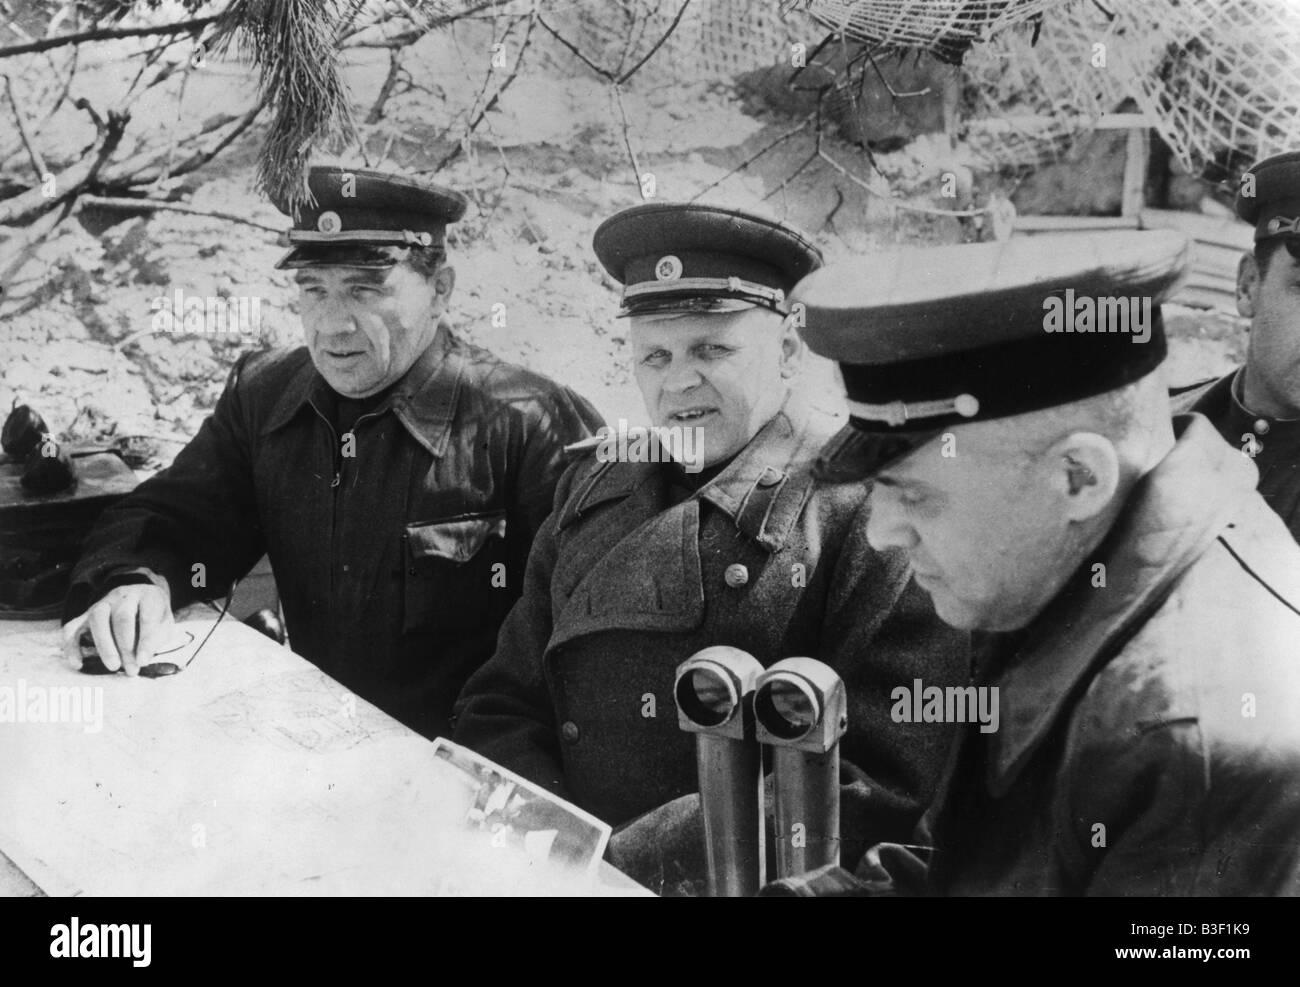 WW2, Telegin, Kasakow, Chuikov 1945 - Stock Image